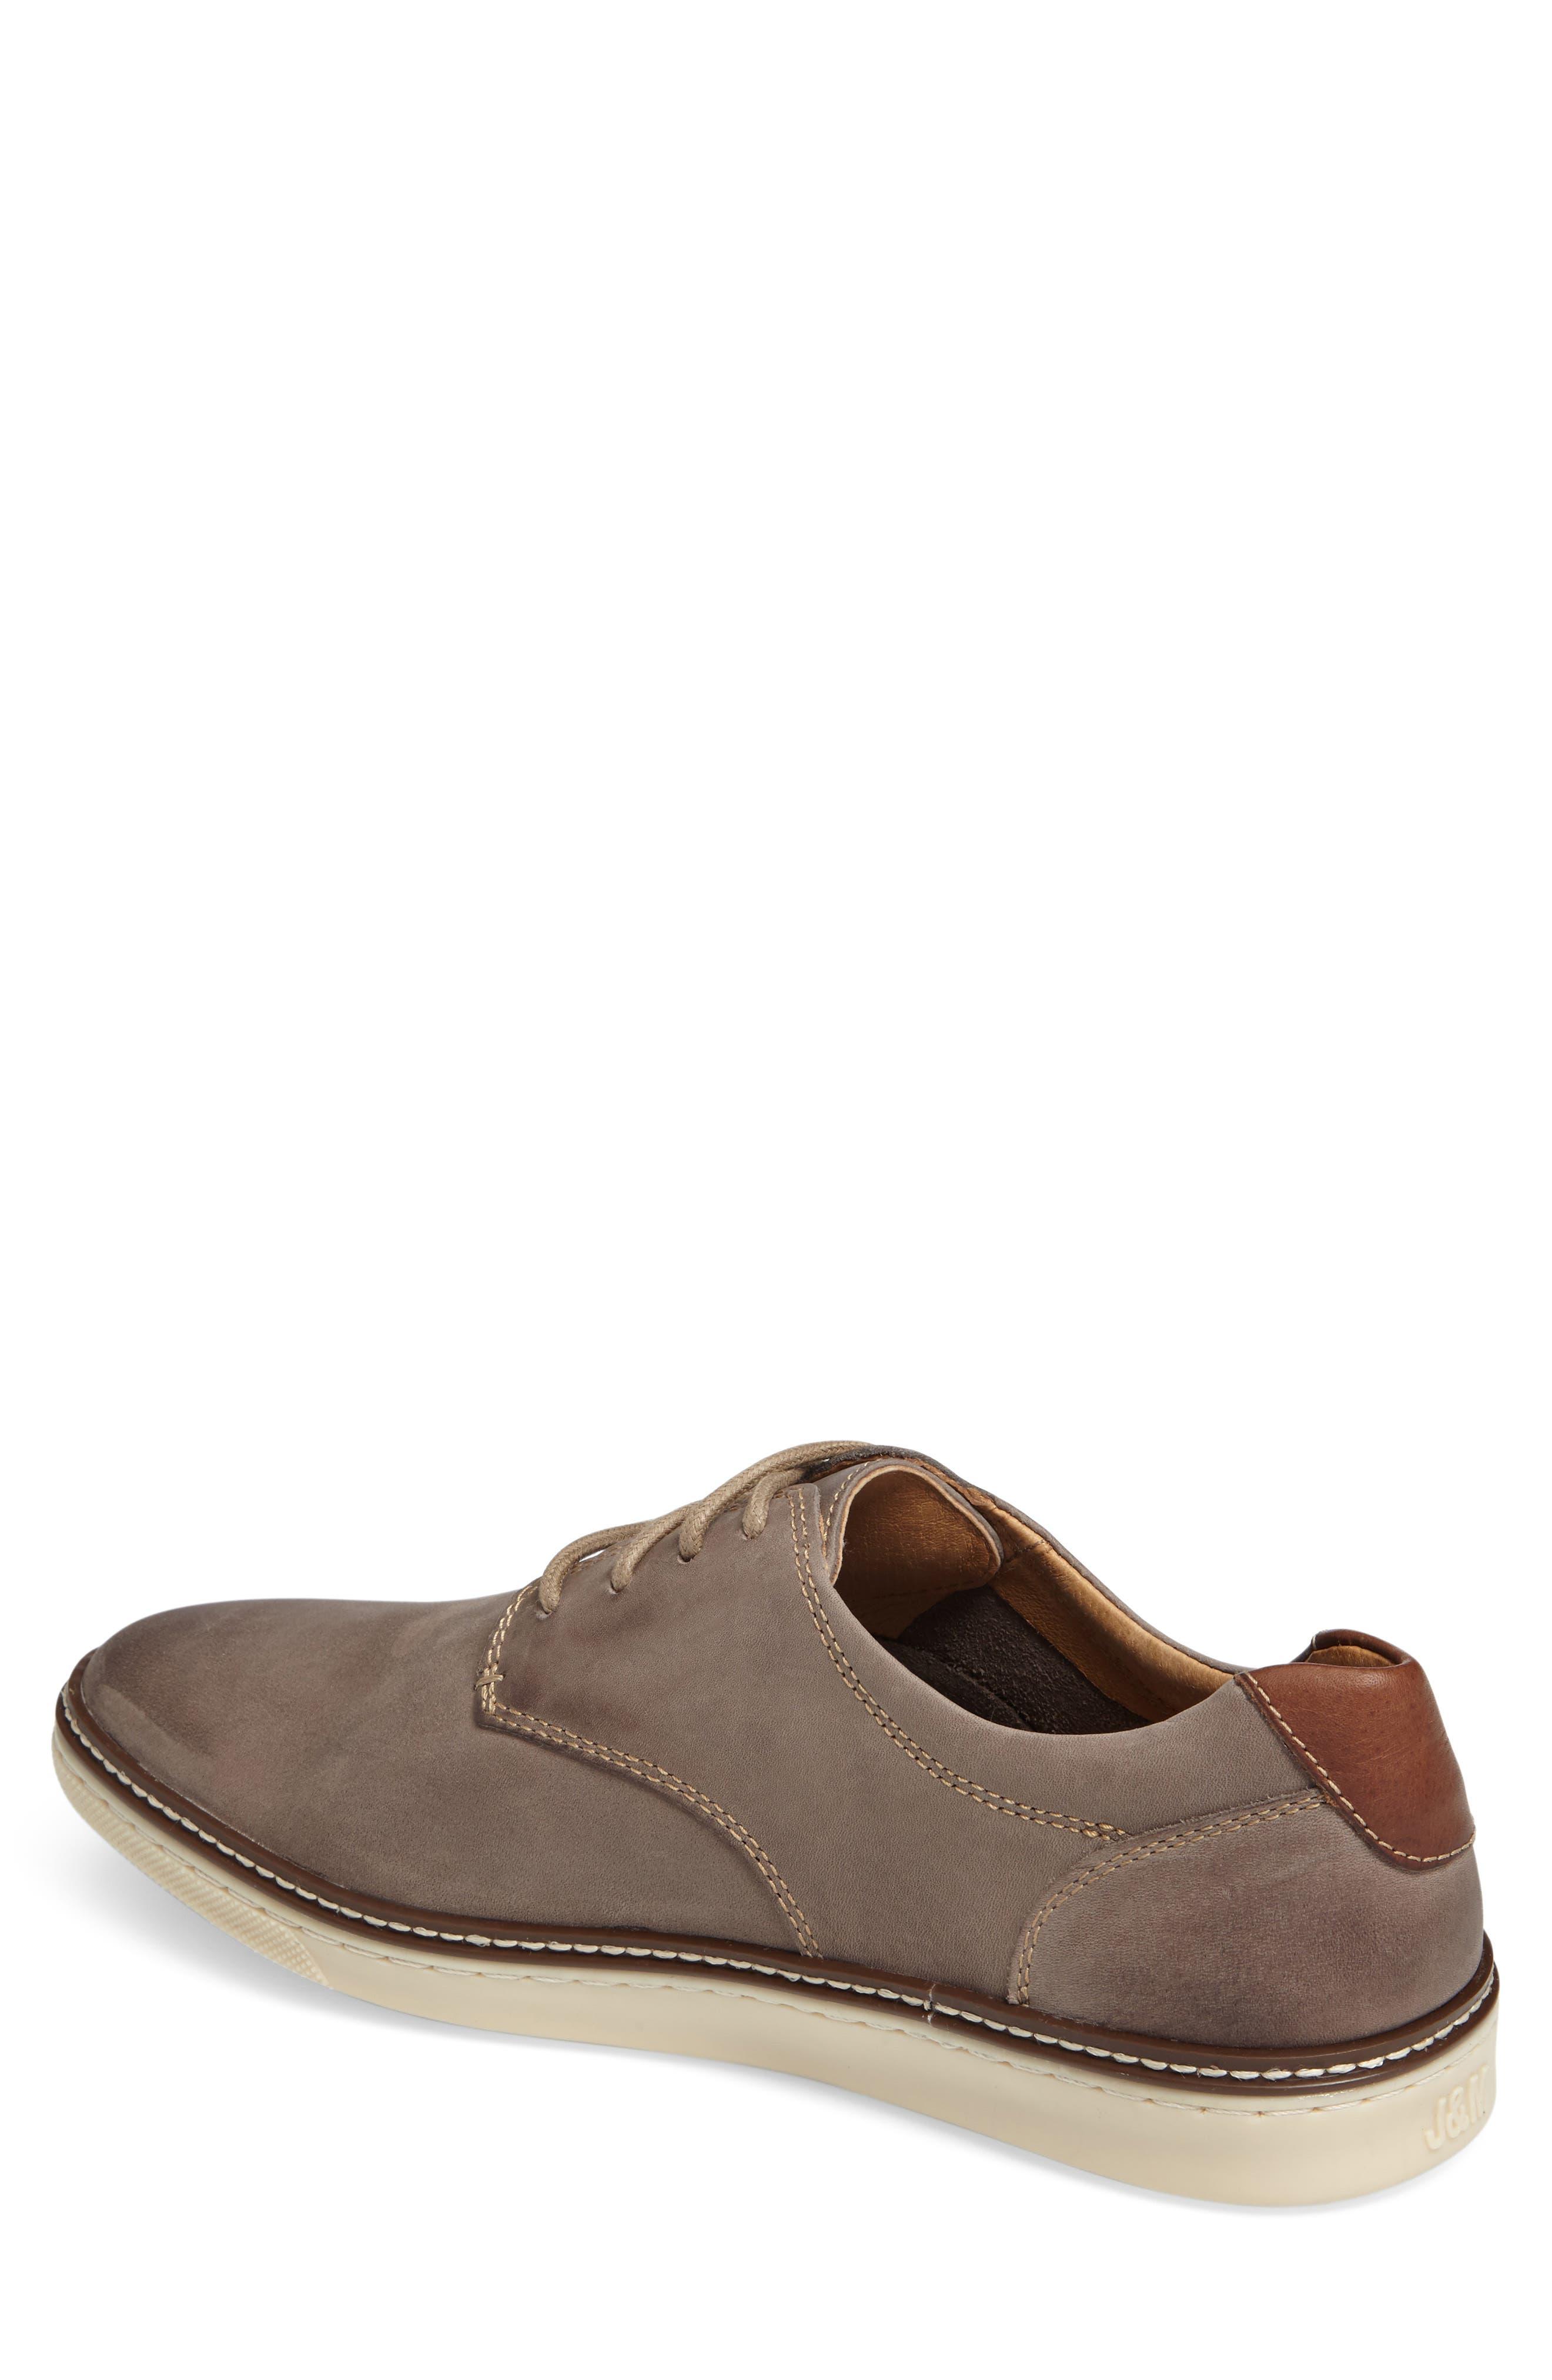 McGuffey Plain Toe Sneaker,                             Alternate thumbnail 2, color,                             GREY NUBUCK LEATHER